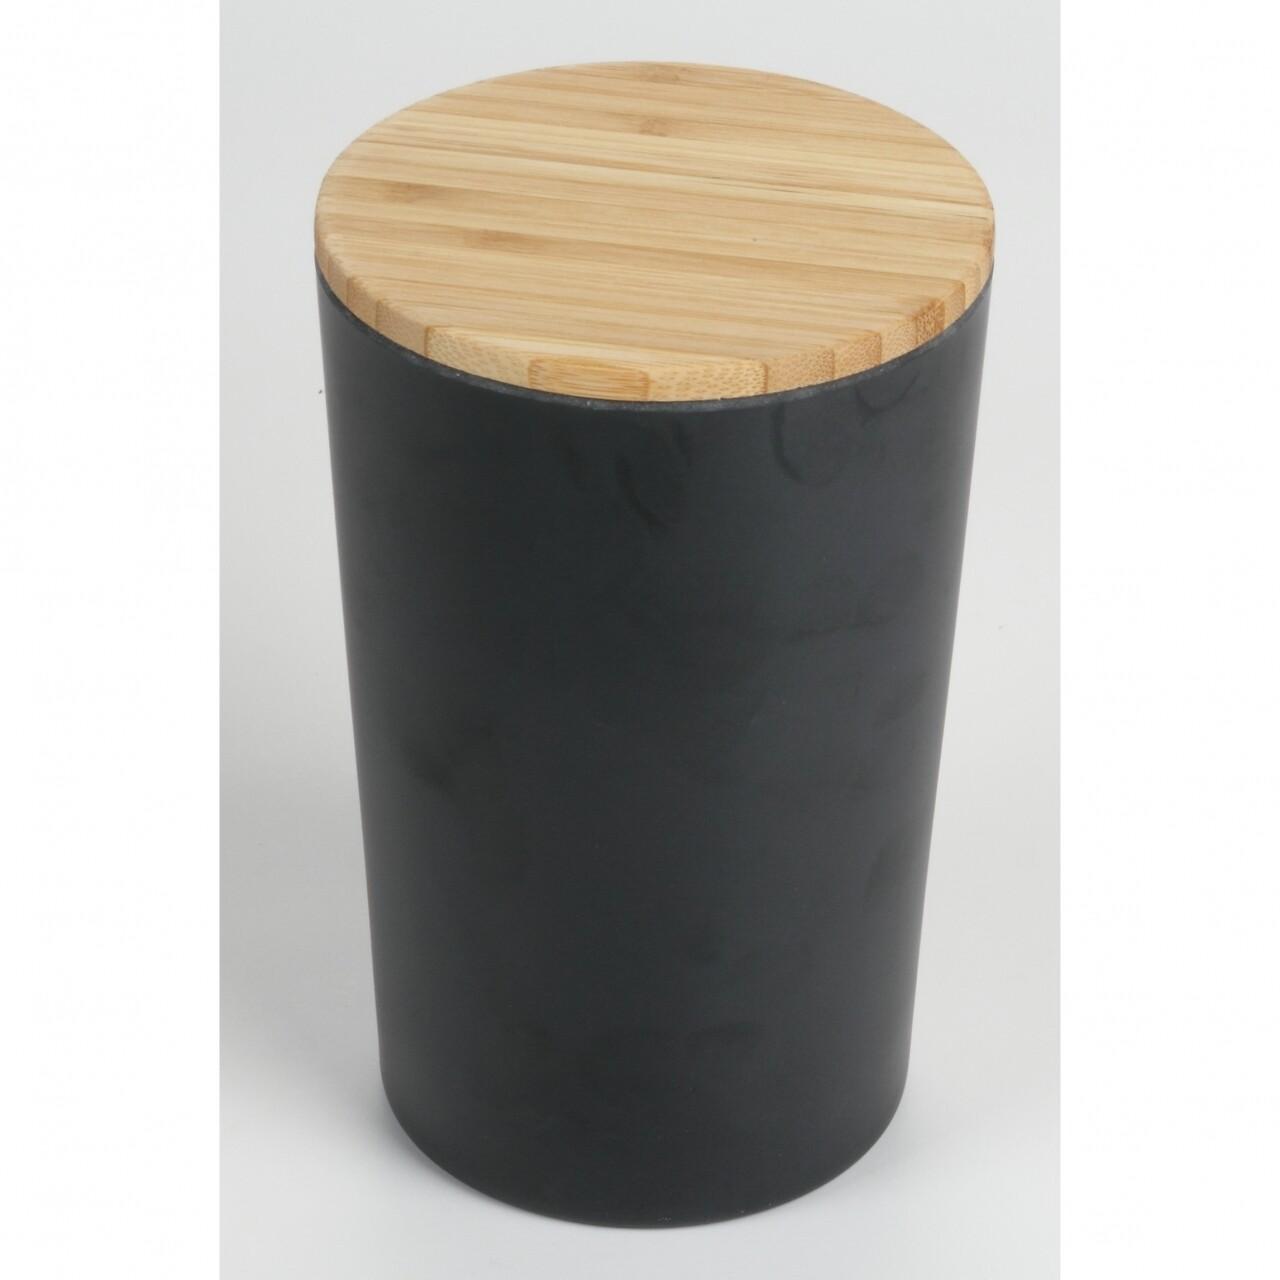 Cutie de depozitare Black Bamboo, Jocca, 12 x 12 x 18.7 cm, bambus, negru/natur